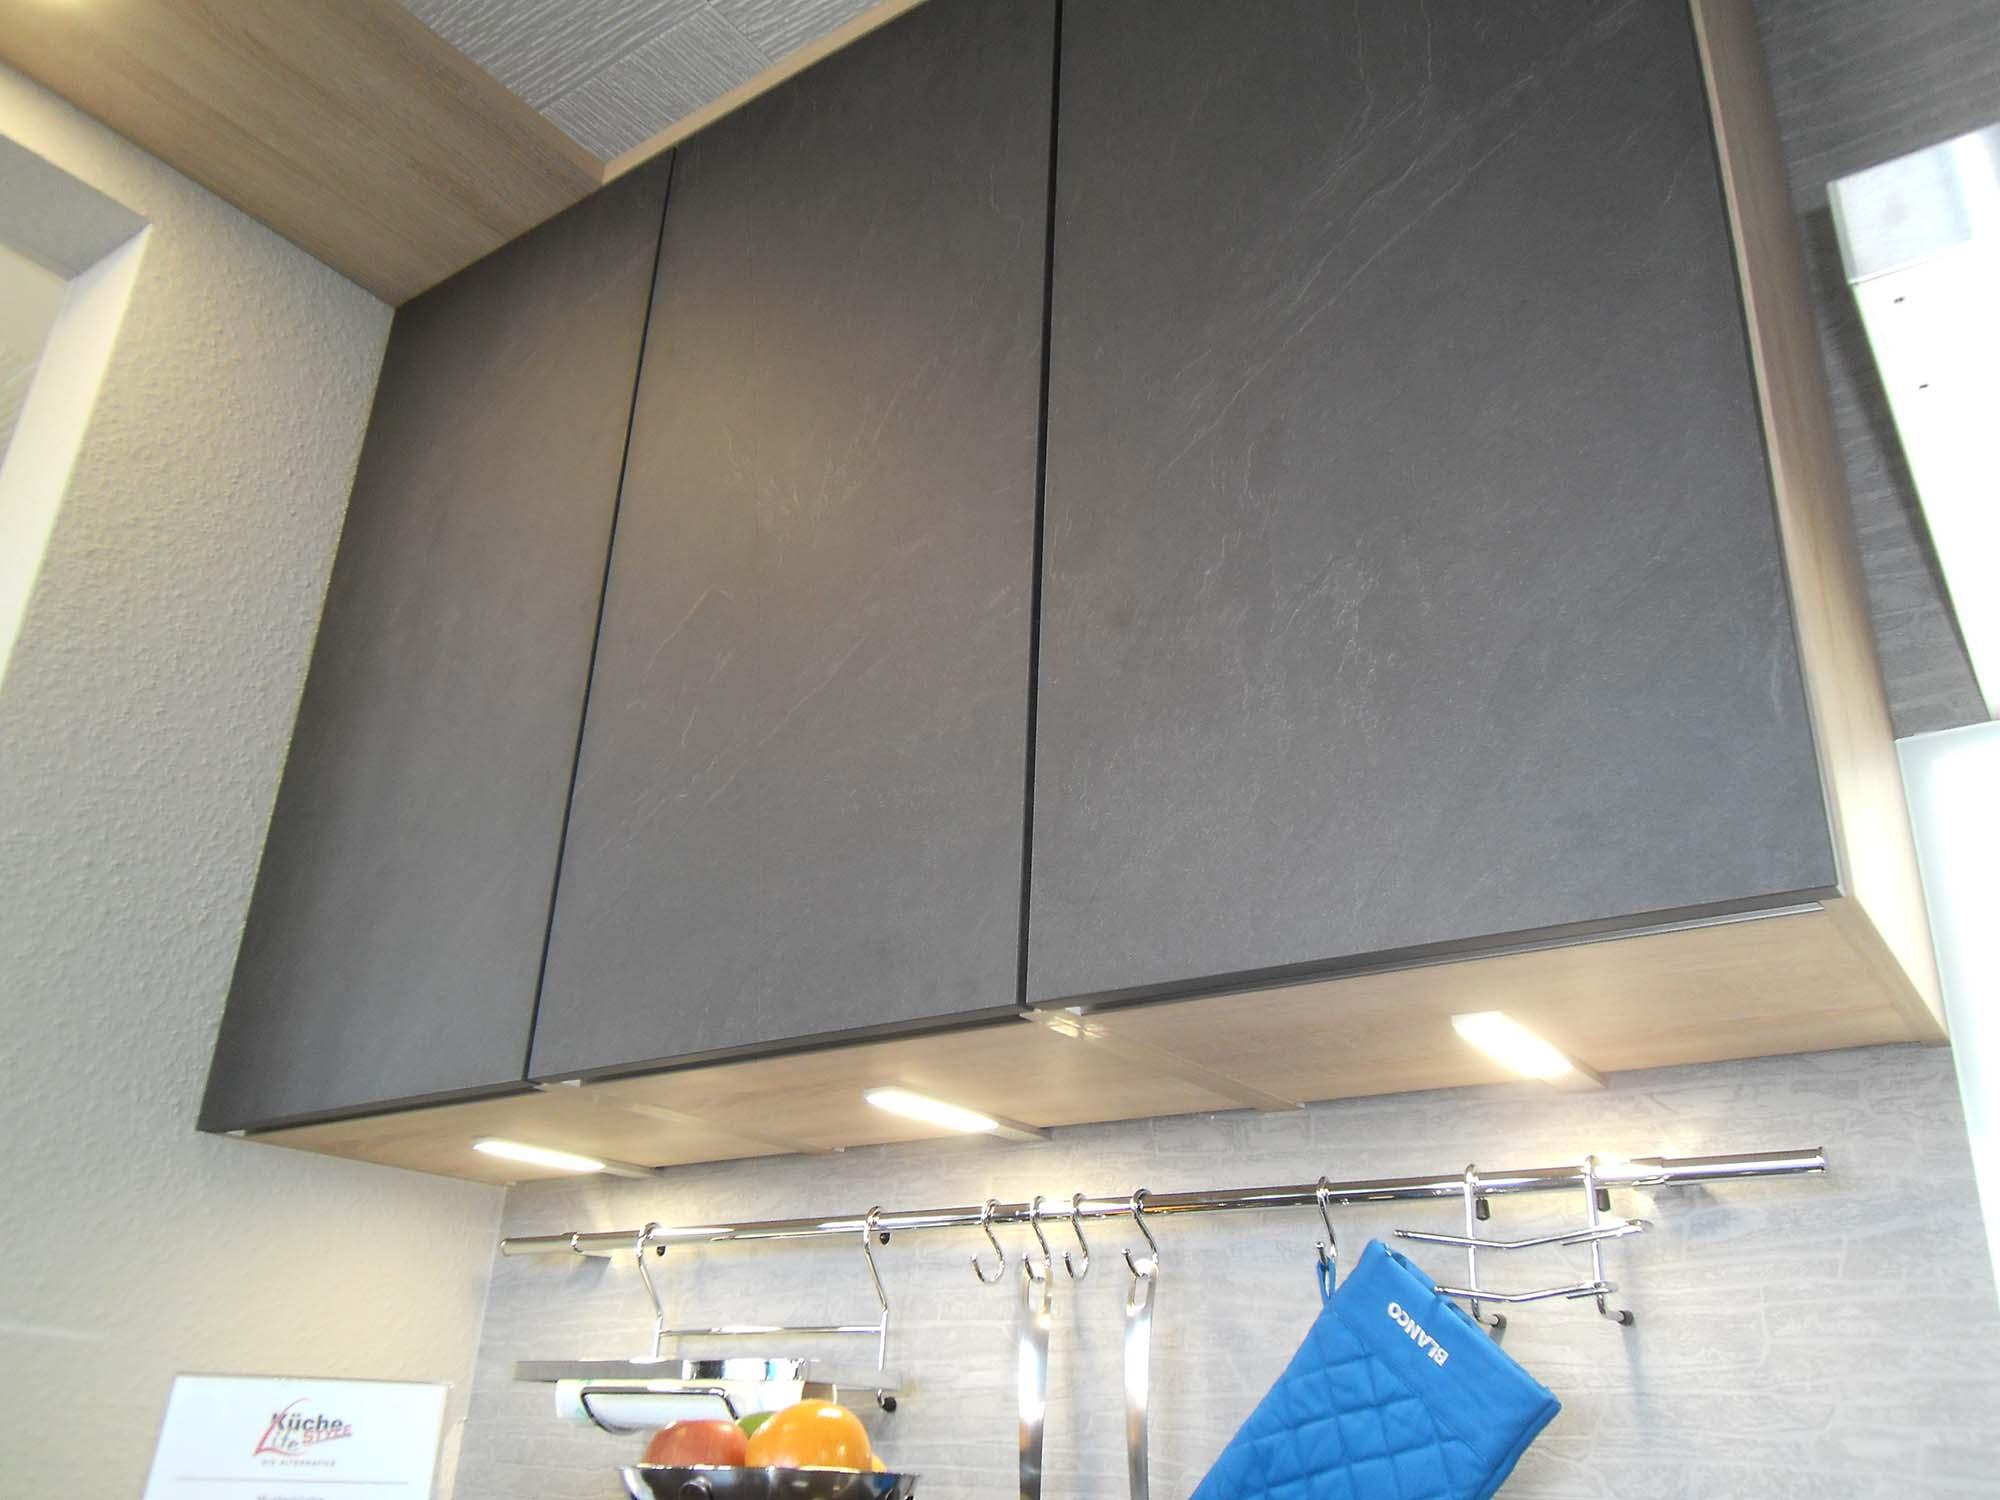 grifflose oberschr nke mit untergebauter led beleuchtung k che life style. Black Bedroom Furniture Sets. Home Design Ideas